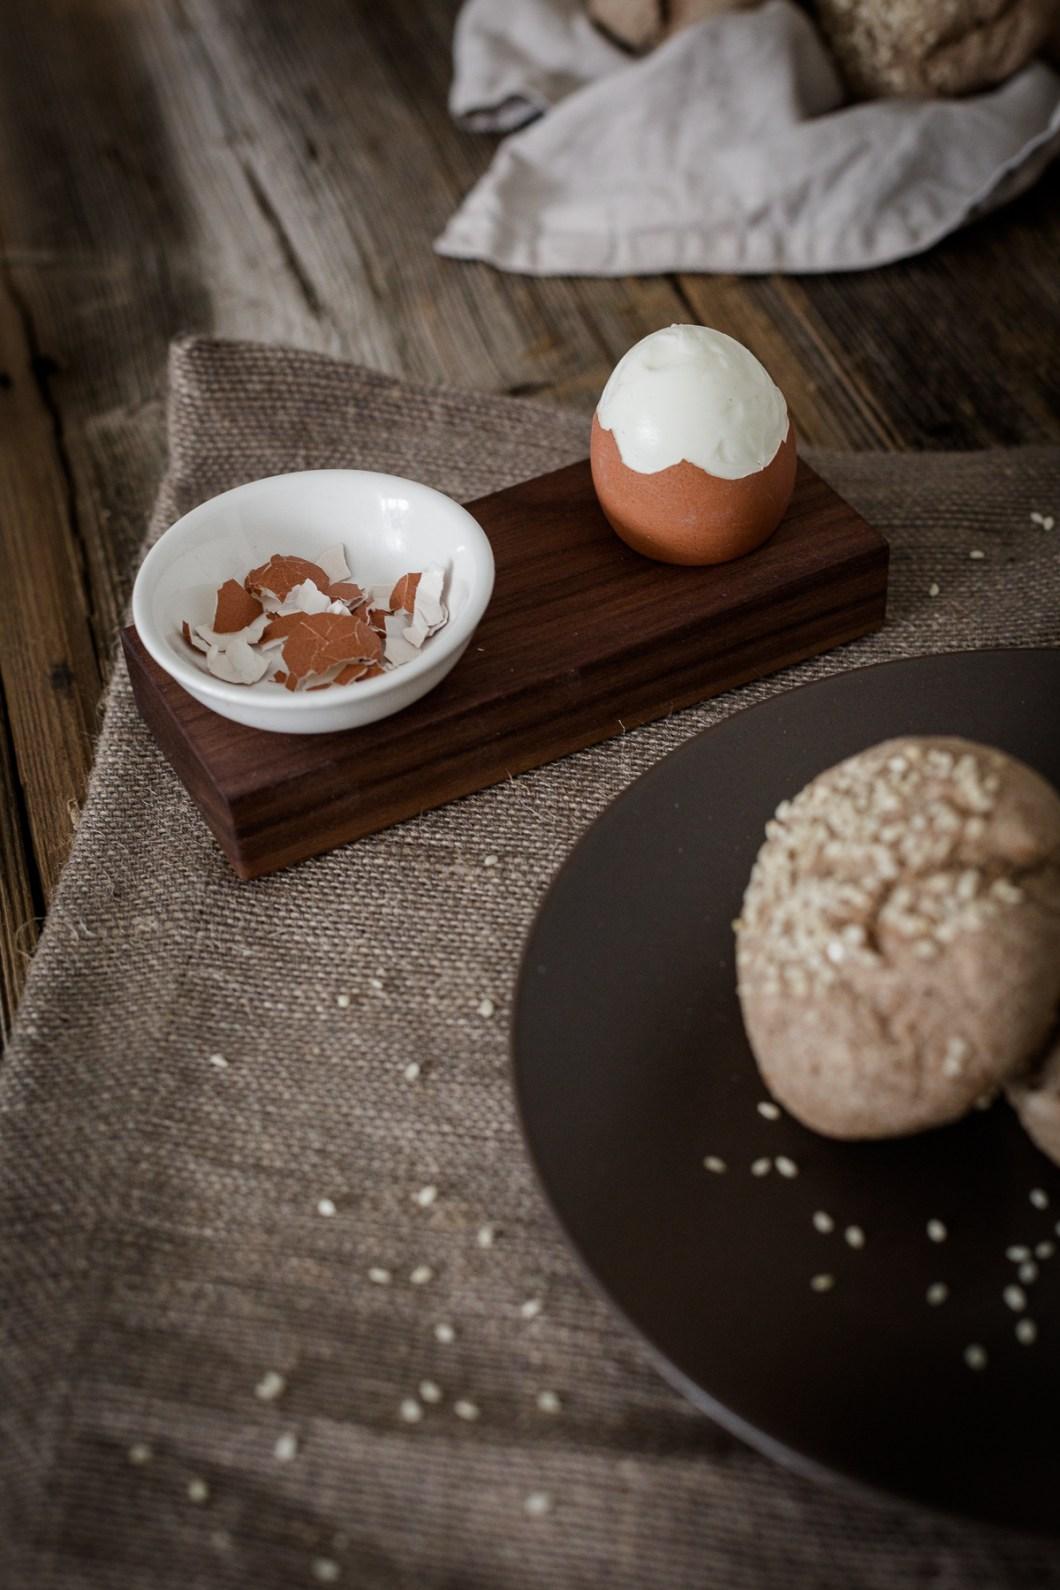 Foodfotografie von nordbrise.net Foodblog & Foodfotografie  | Sesam-Vollkorn-Weckerl | Pastries Buns Sesame Seeds